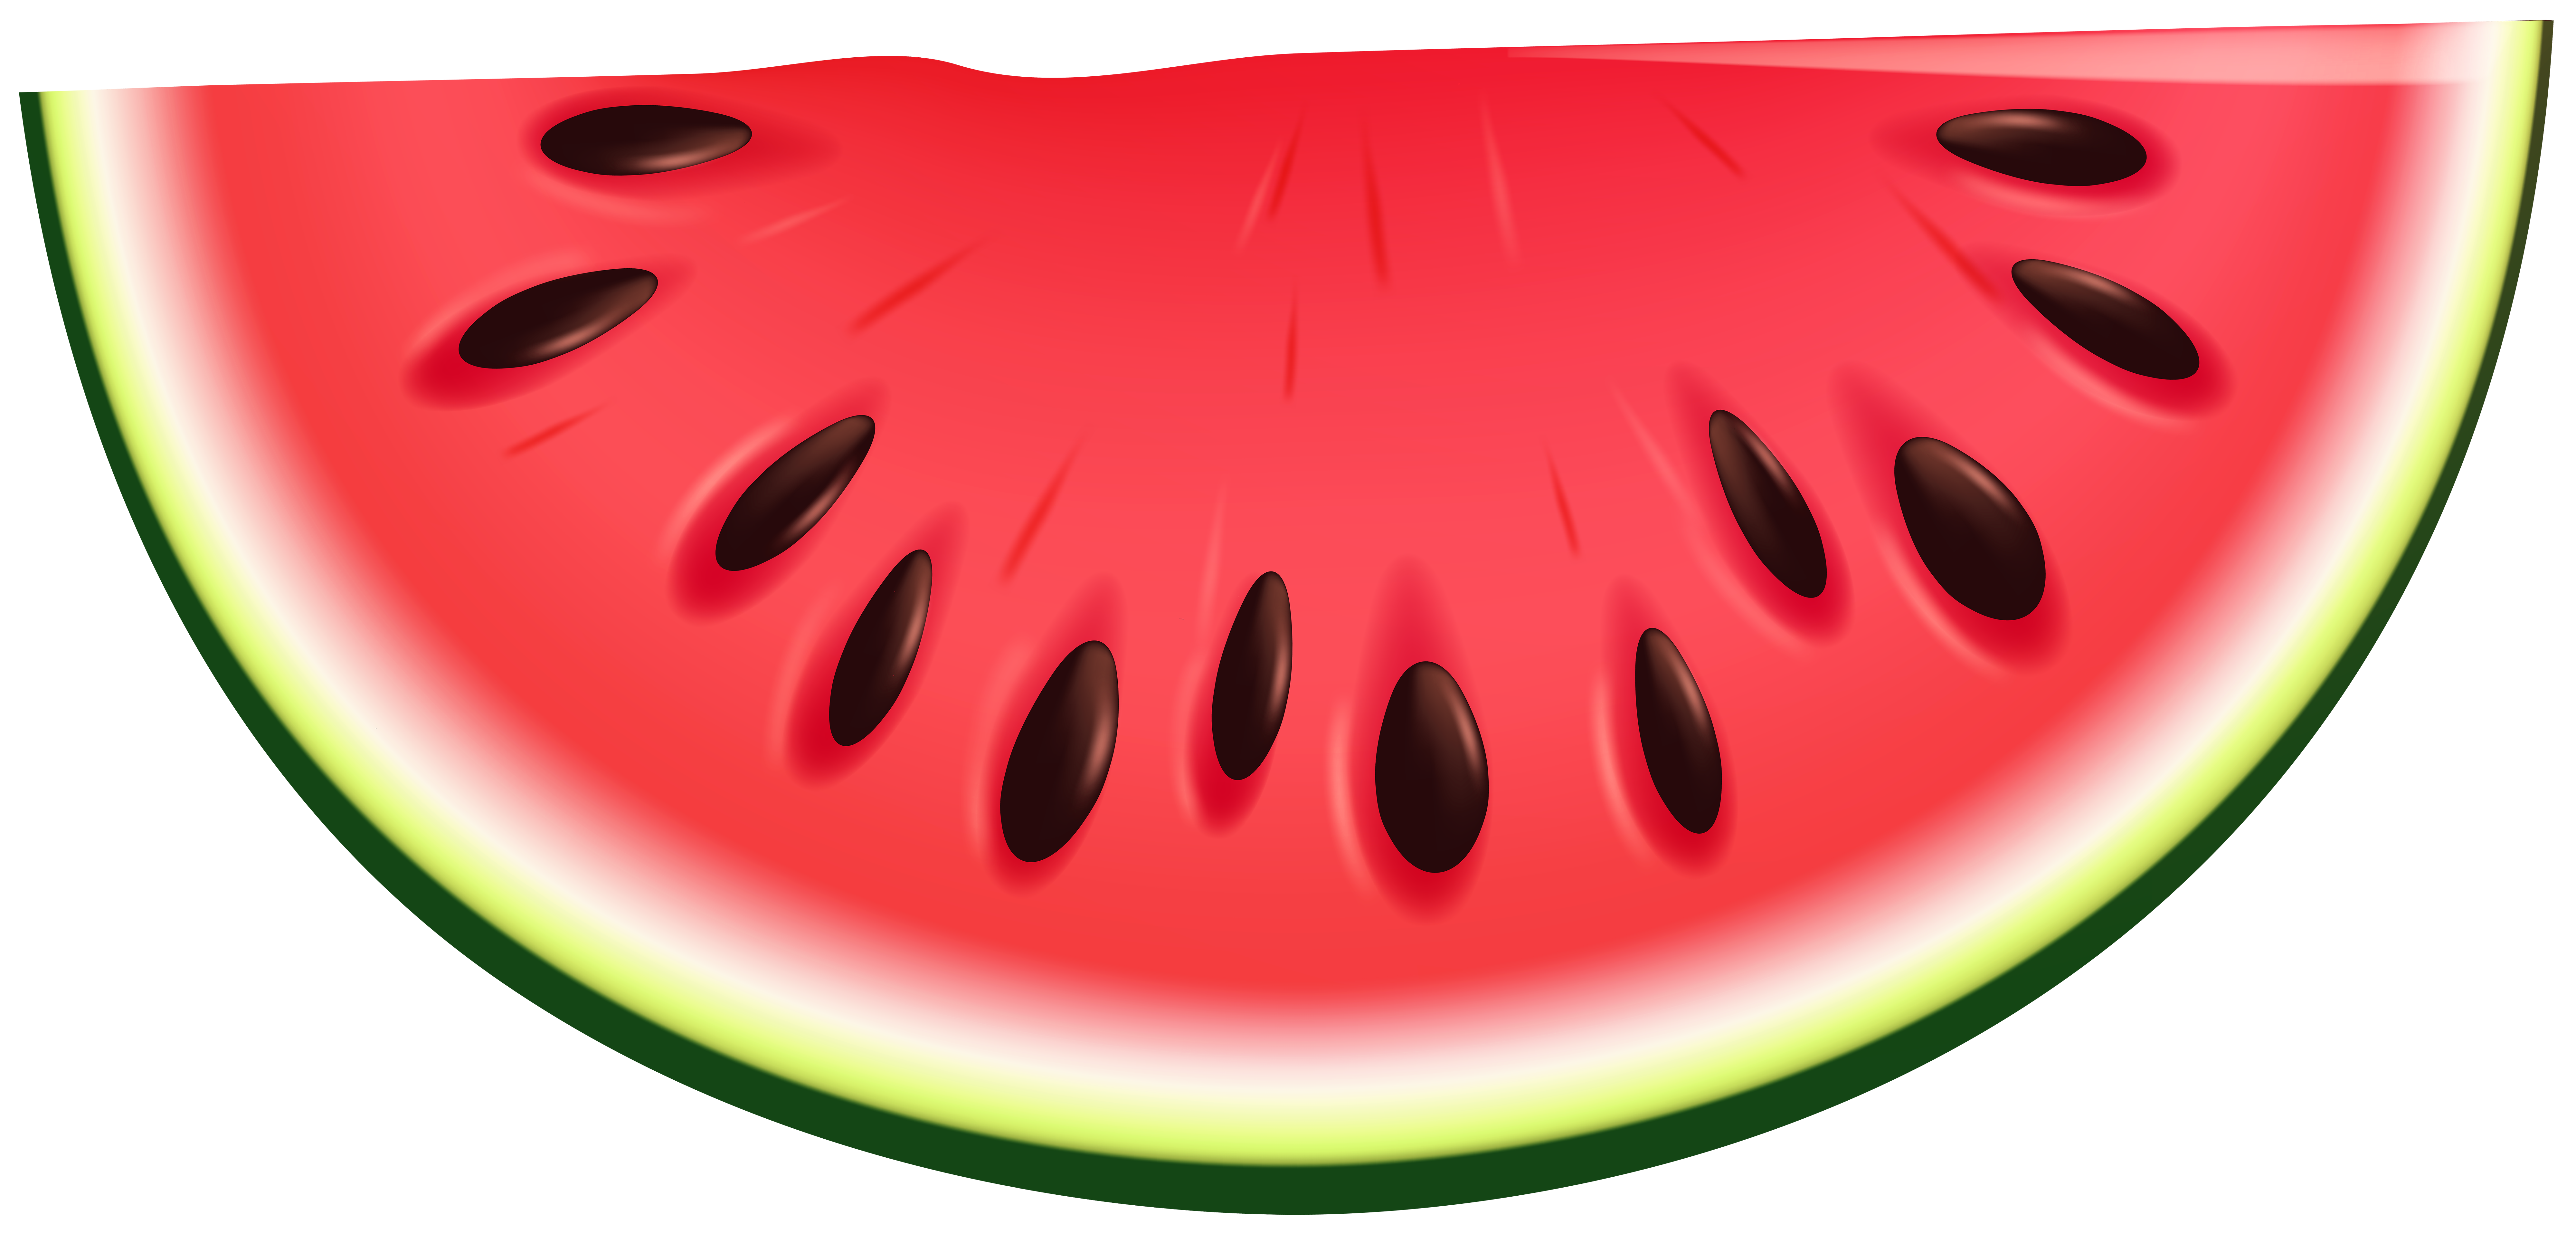 Watermelon Clipart-Clipartlook.com-8000-Watermelon Clipart-Clipartlook.com-8000-17